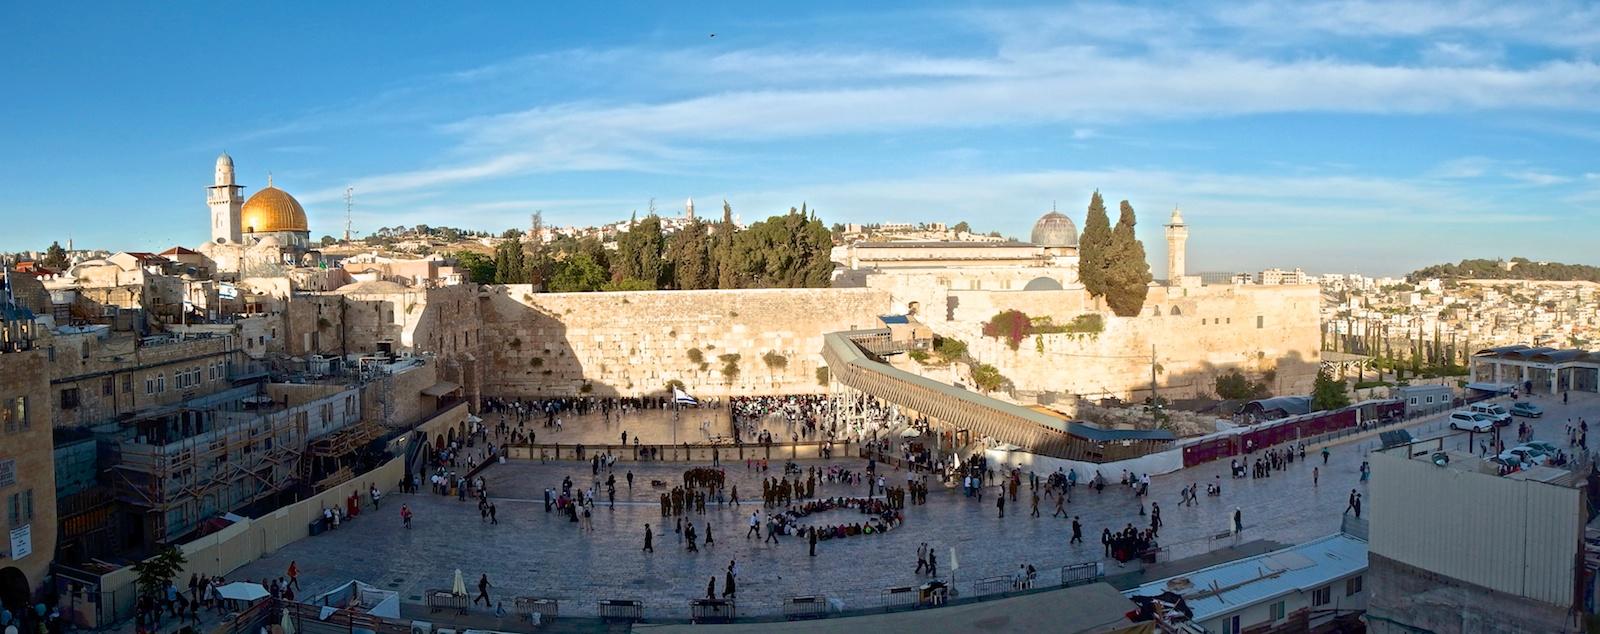 2014-05_JERUSALEM_1475_s_PANORAMA